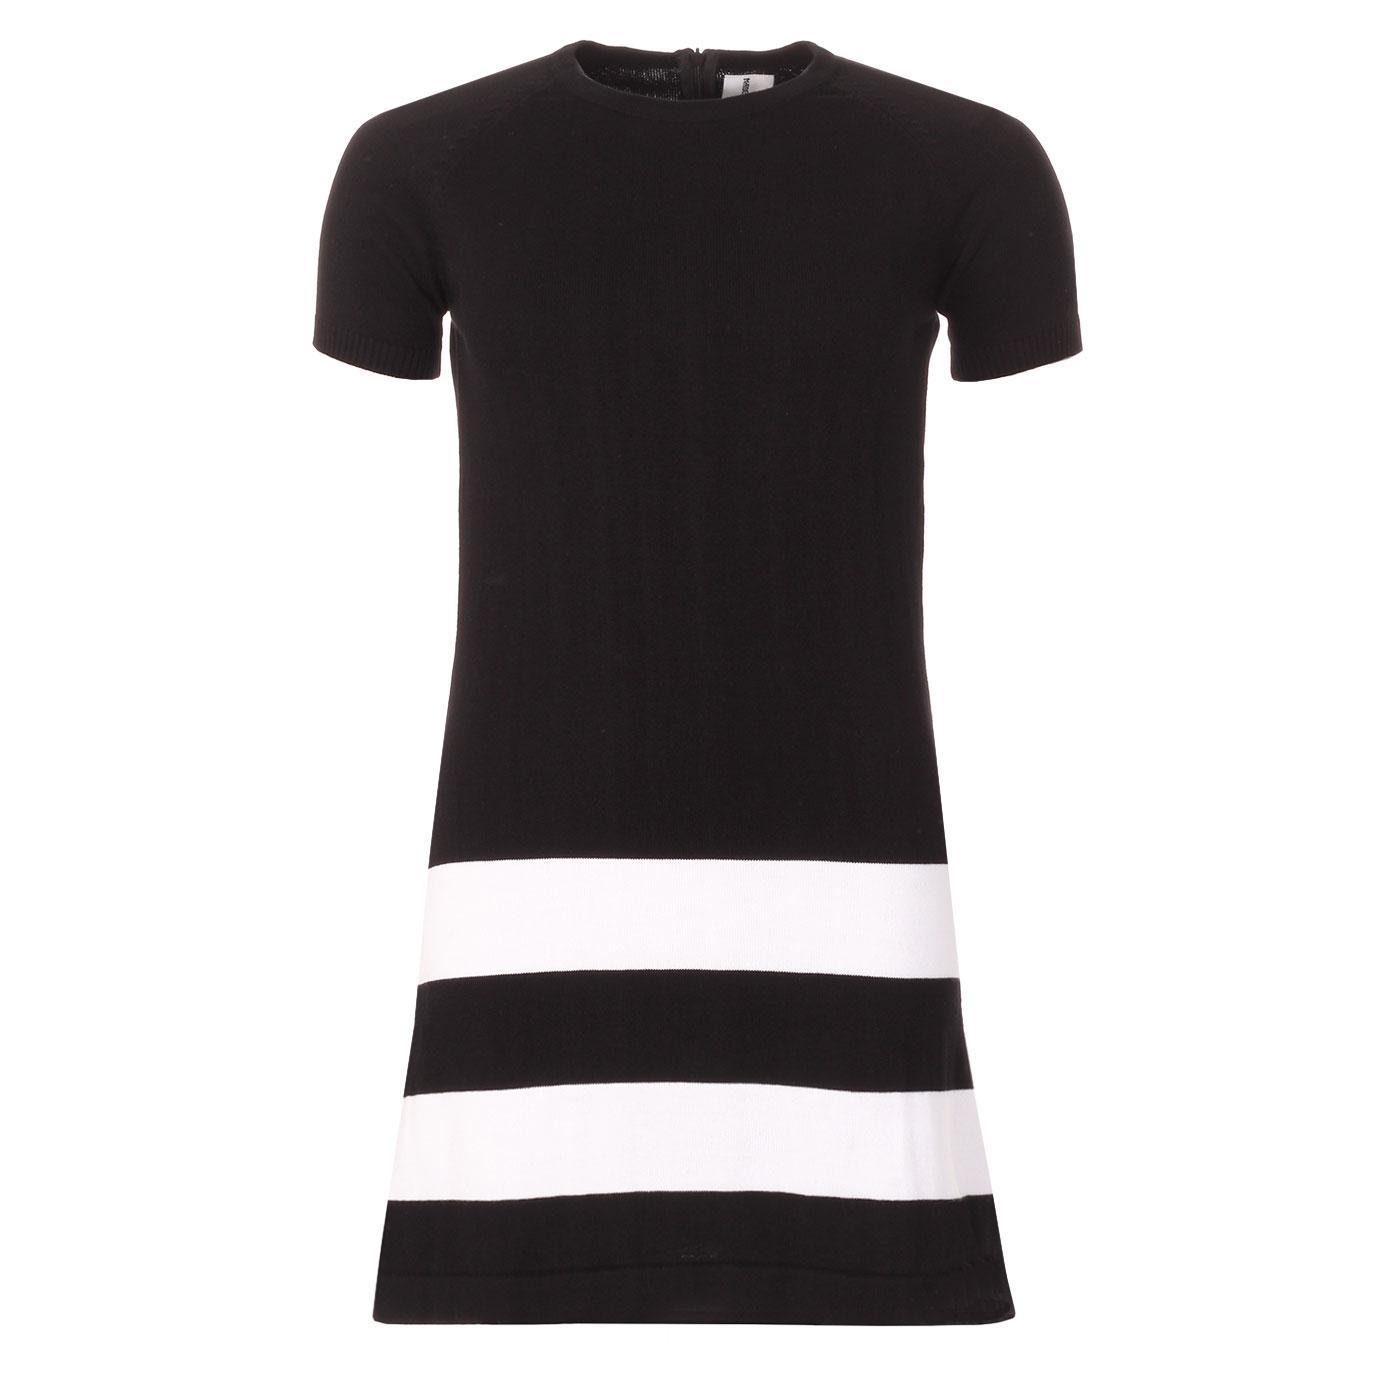 Madcap England 60s Mod Hoop Hem Knitted Dress in Black/White